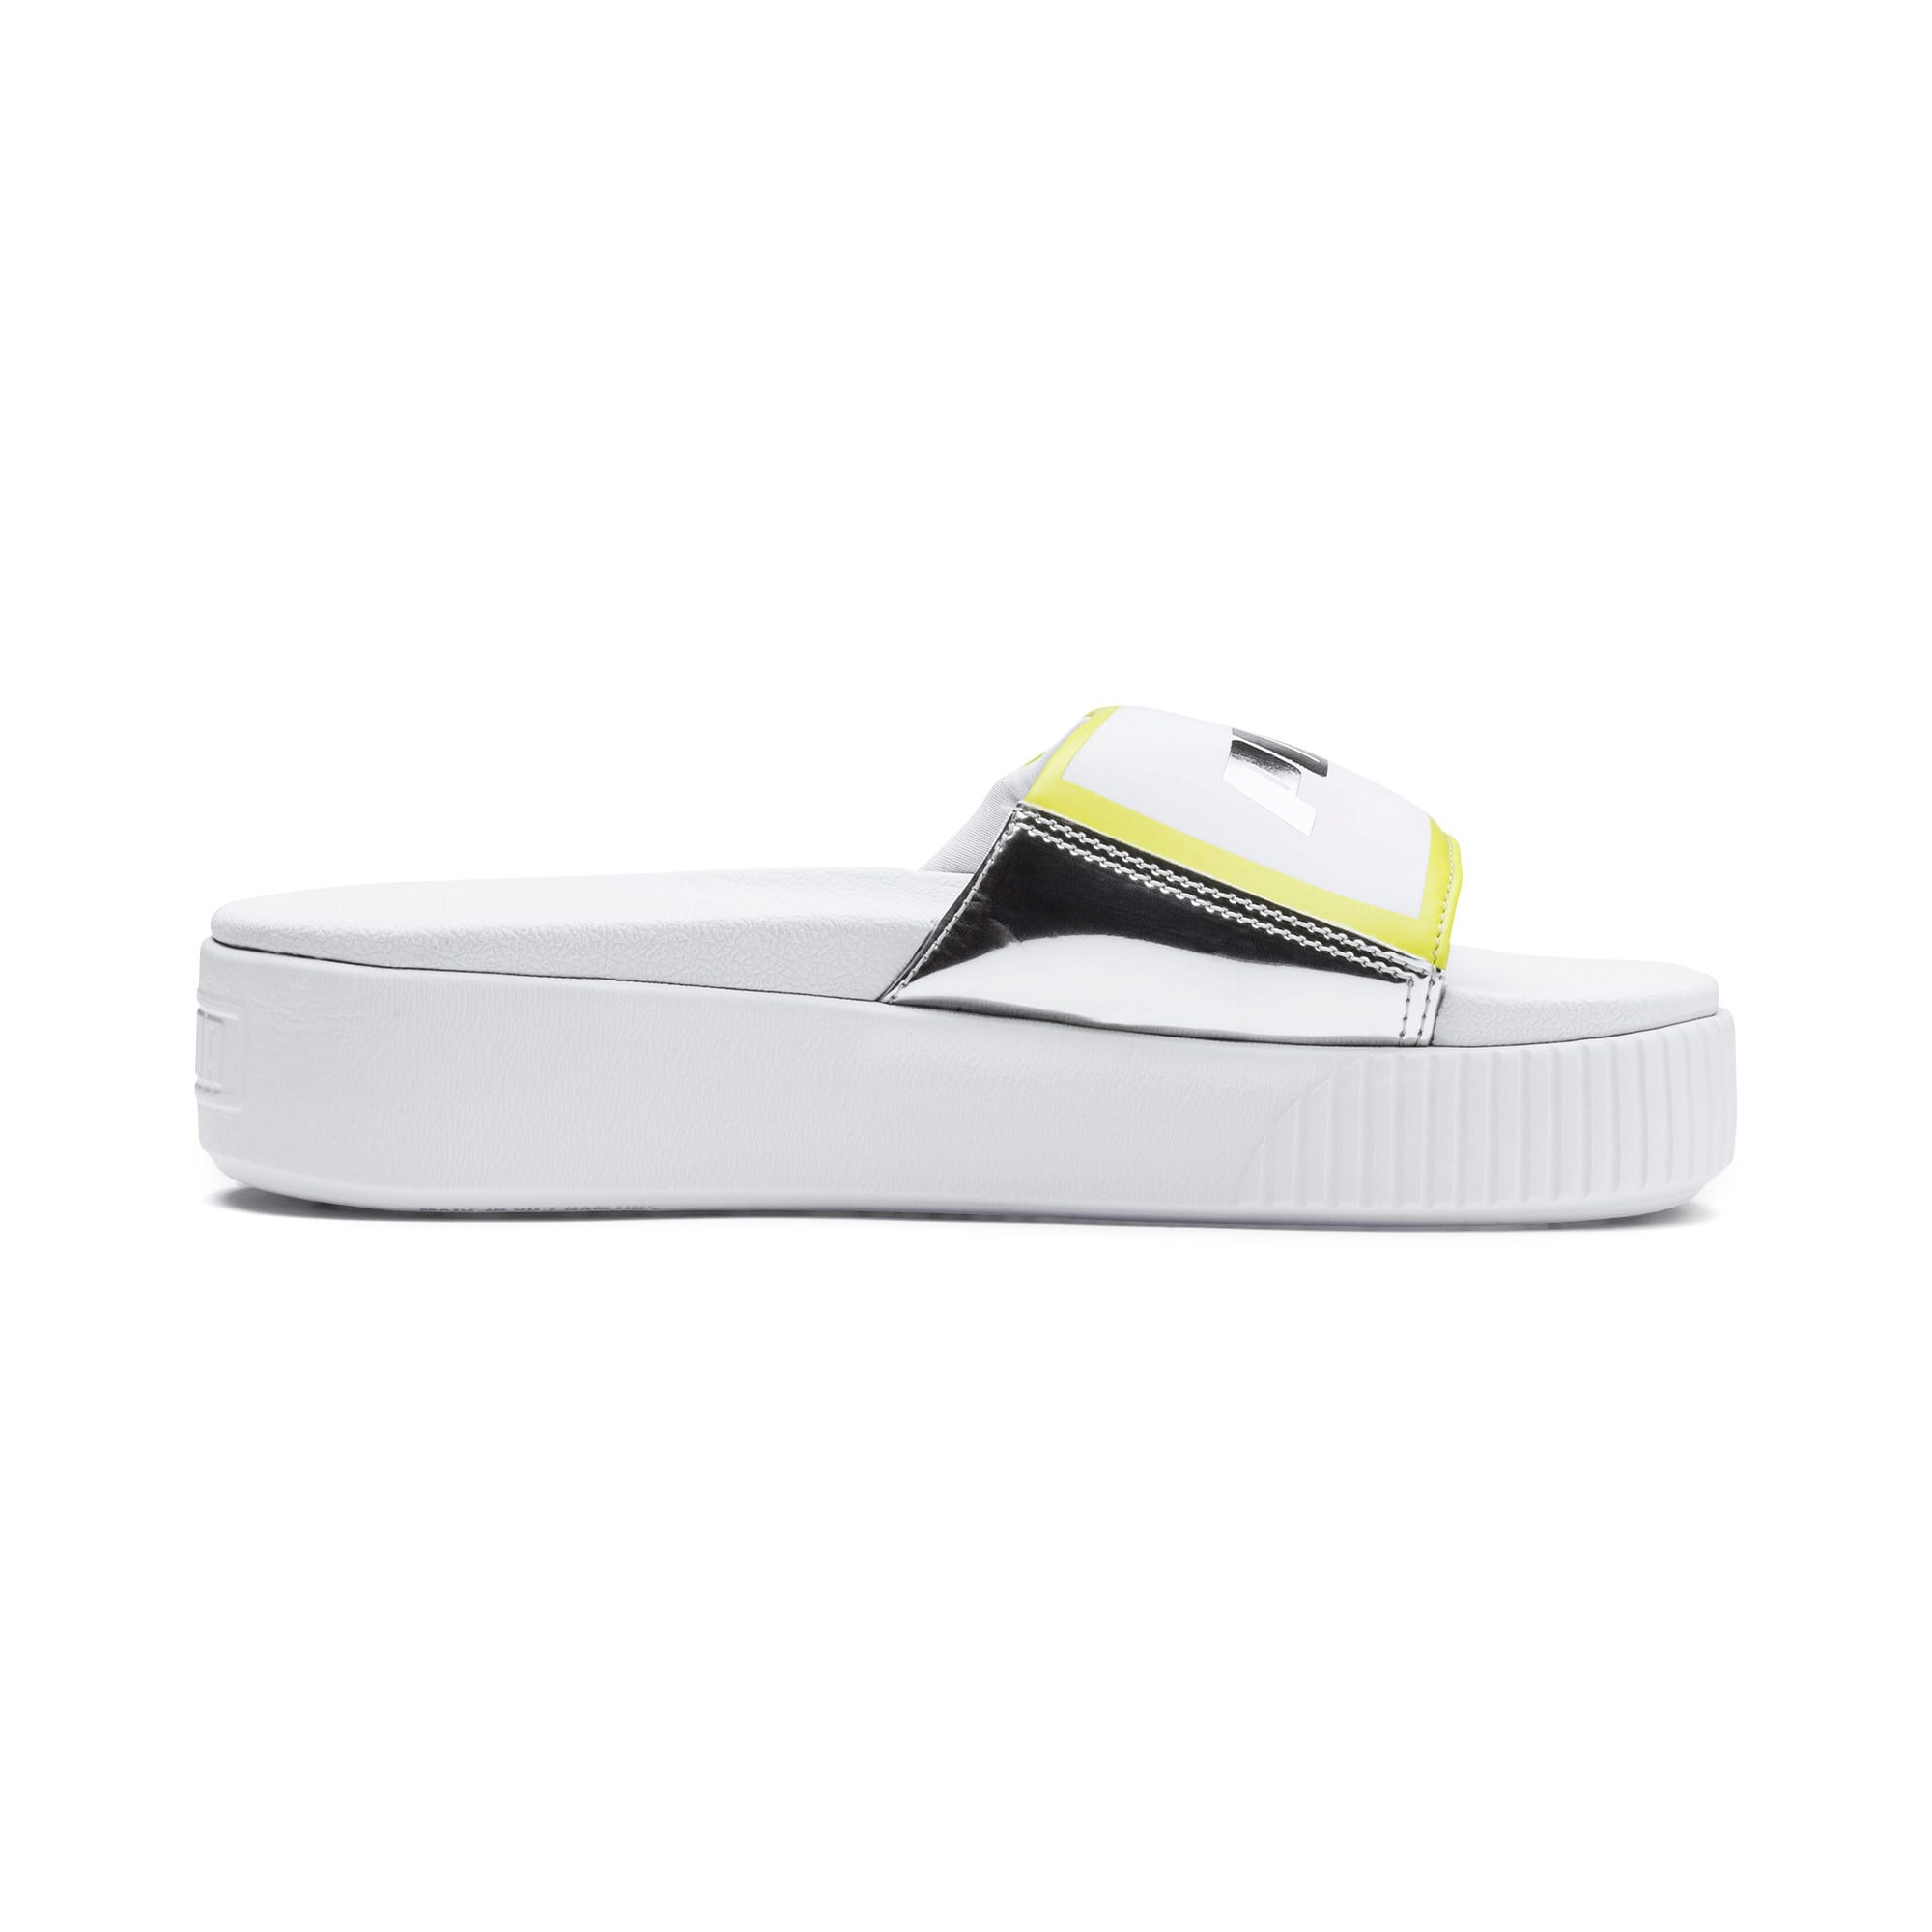 Thumbnail 5 of Platform Slide Trailblazer Metallic Women's Sandals, Puma White-Puma Silver, medium